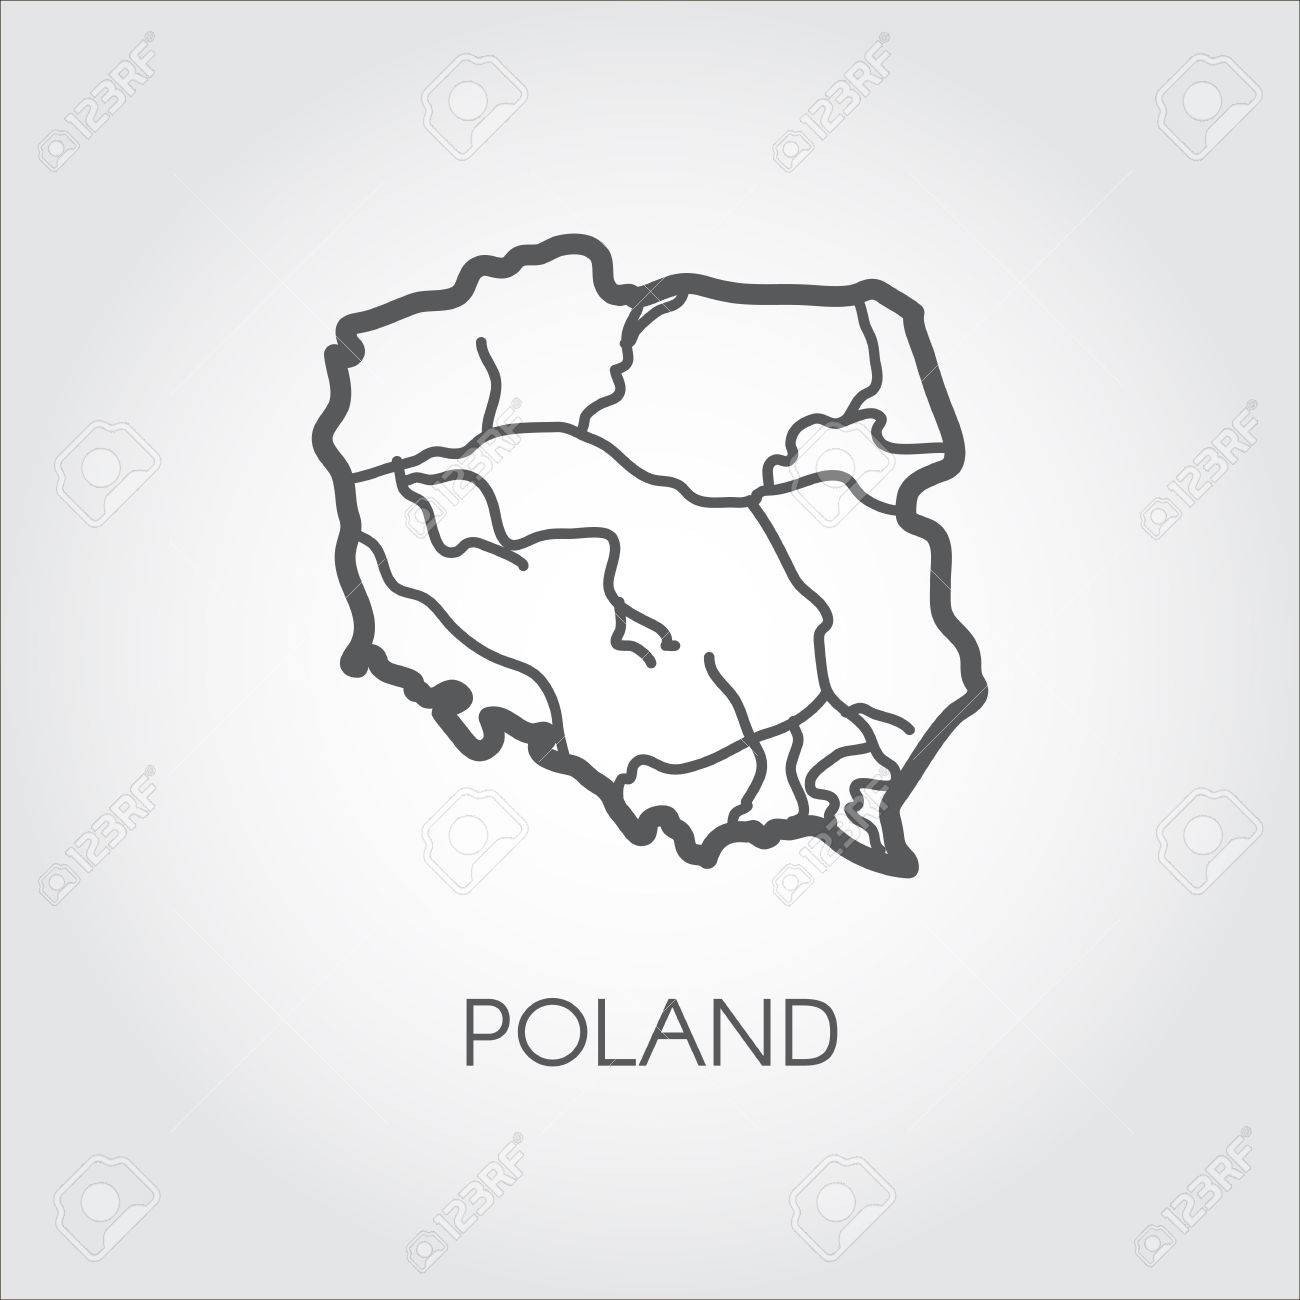 Polen Karte Umriss.Stock Photo